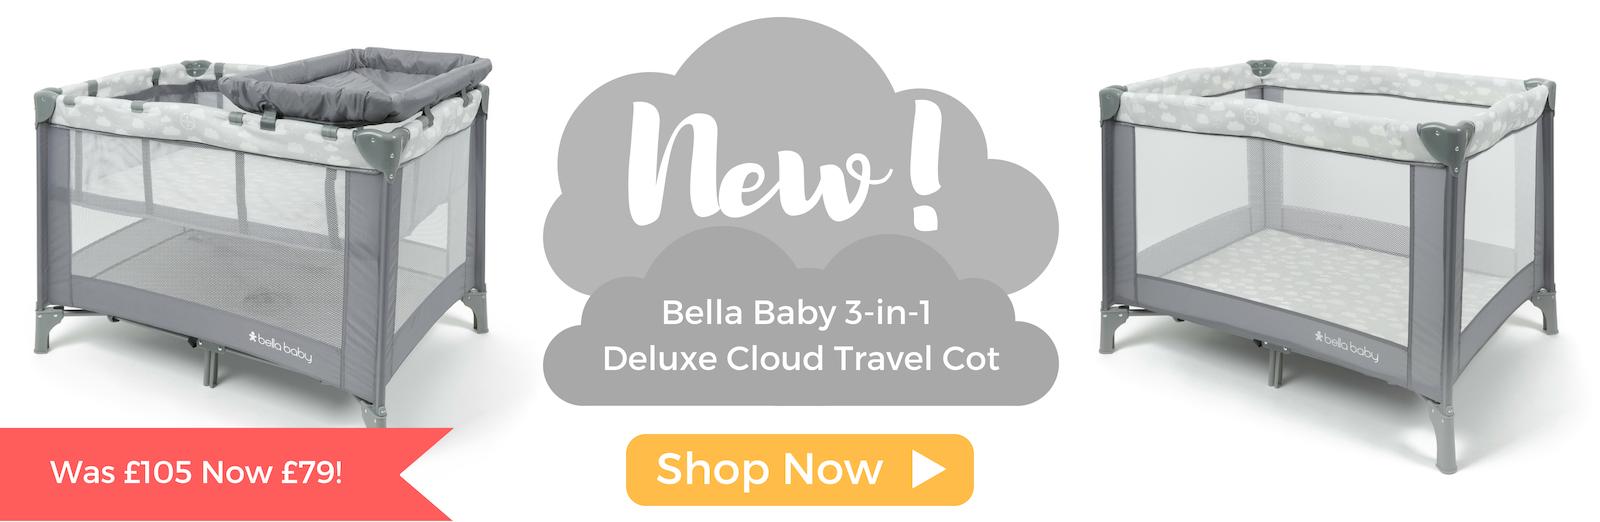 Bella Baby Travel Cot